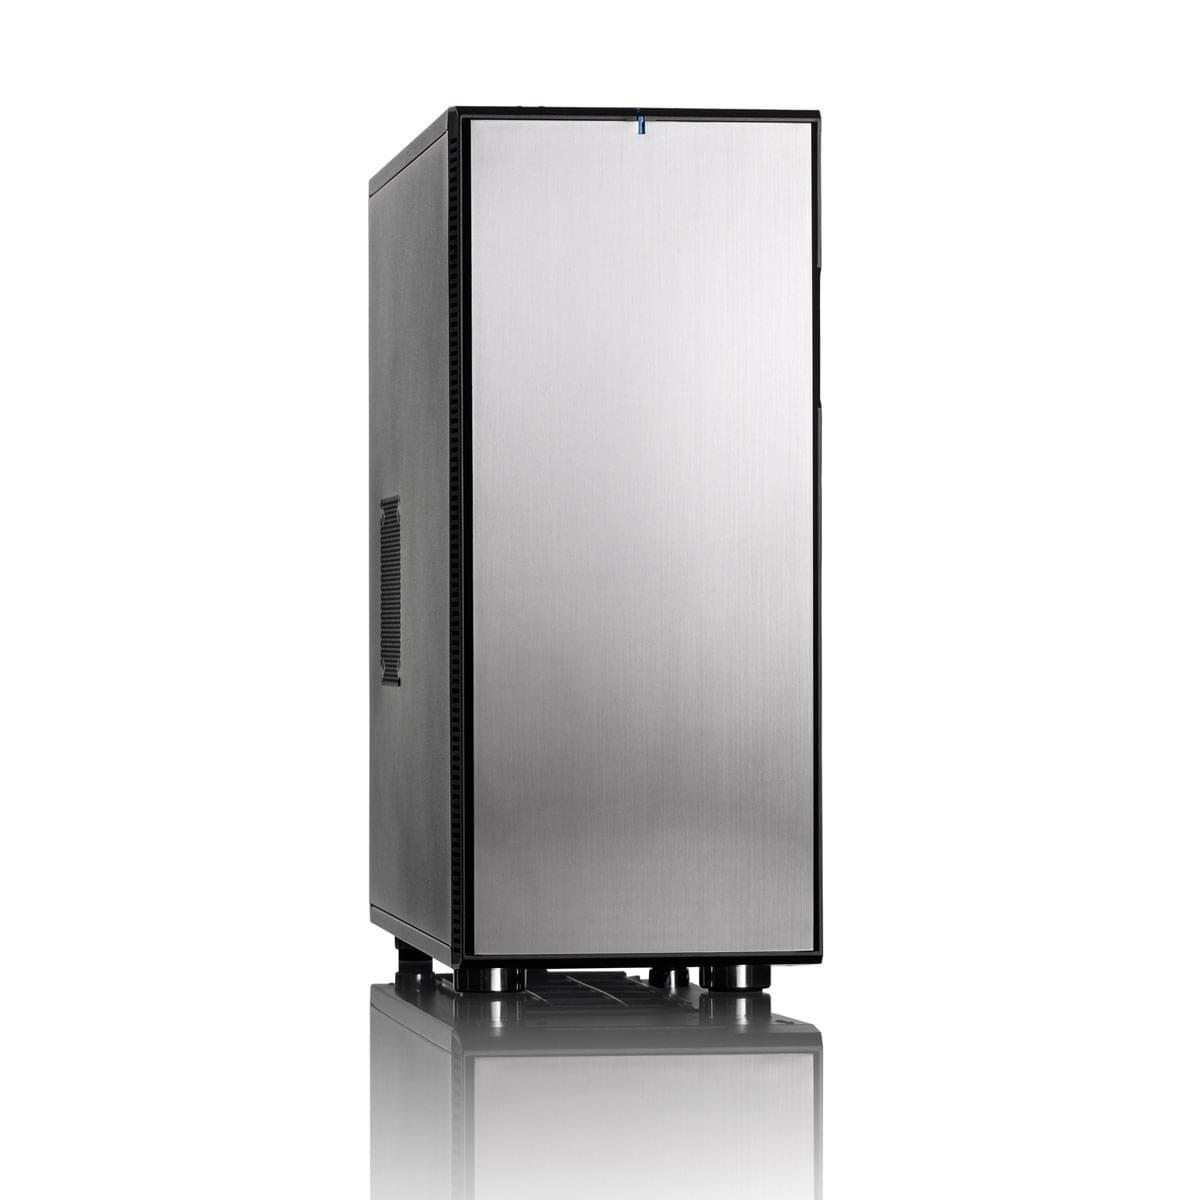 Fractal Design Define XL R2 Titanium Grey (FD-CA-DEF-XL-R2-TI) - Achat / Vente Boîtier PC sur Cybertek.fr - 0